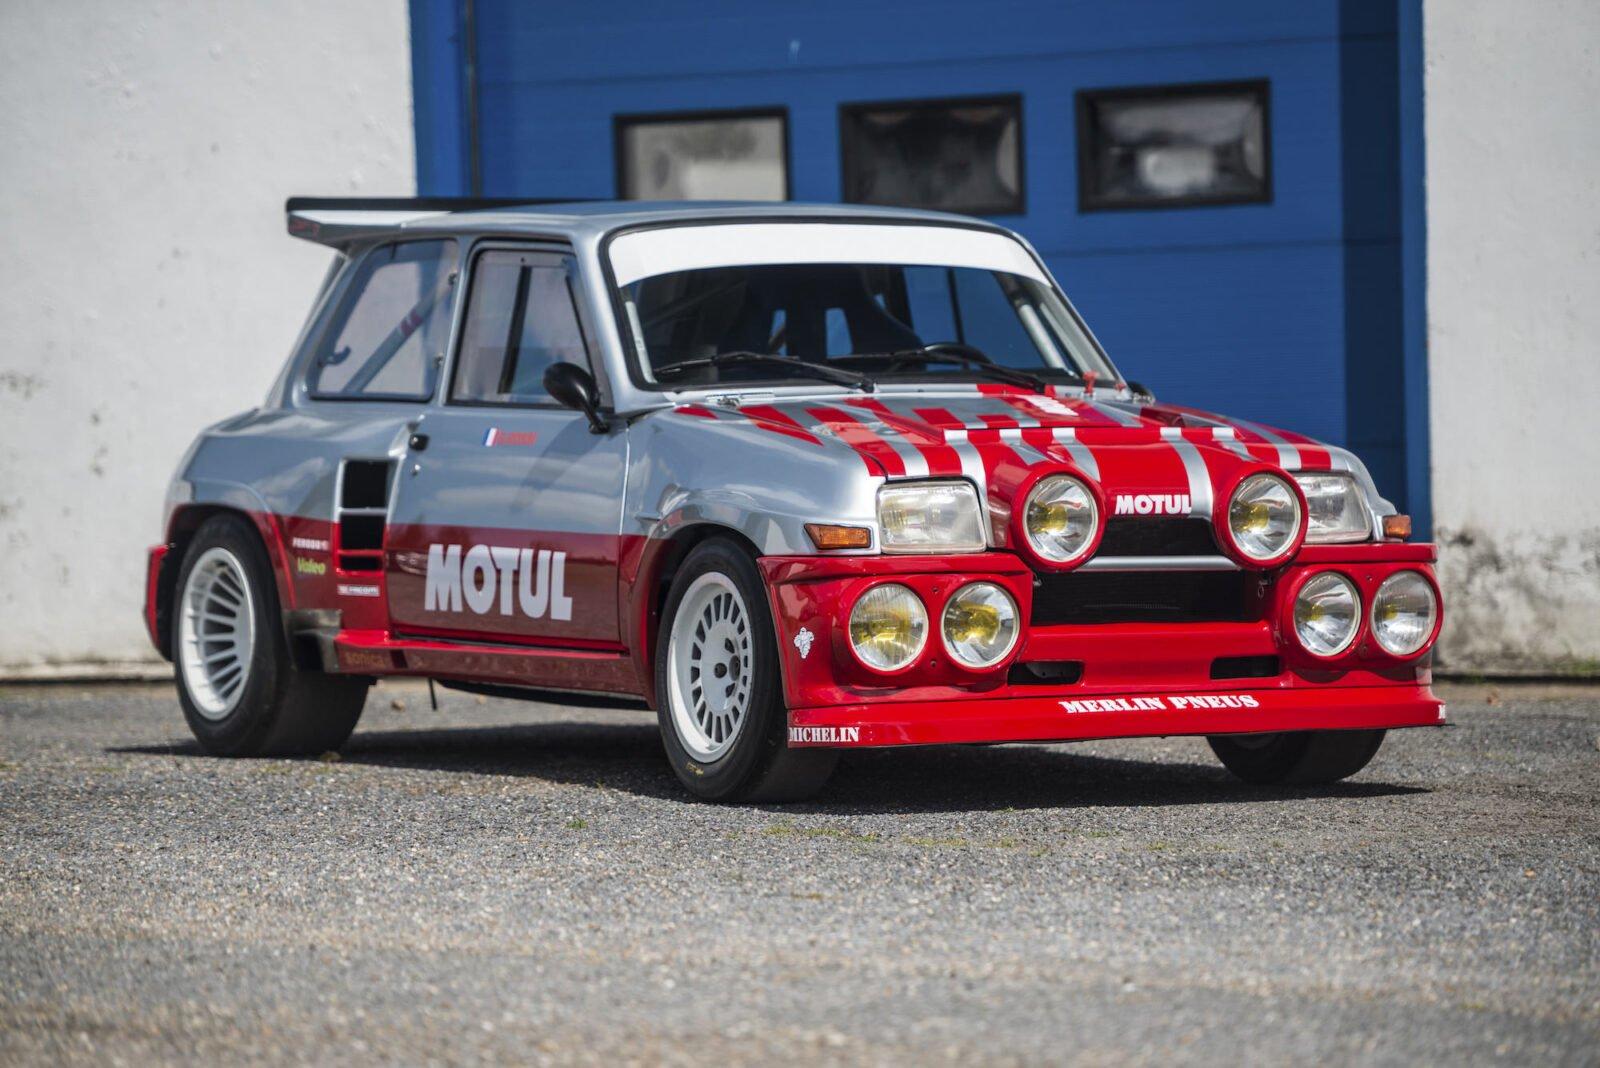 Renault 5 Maxi Turbo 1600x1068 - 1986 Renault 5 Maxi Turbo